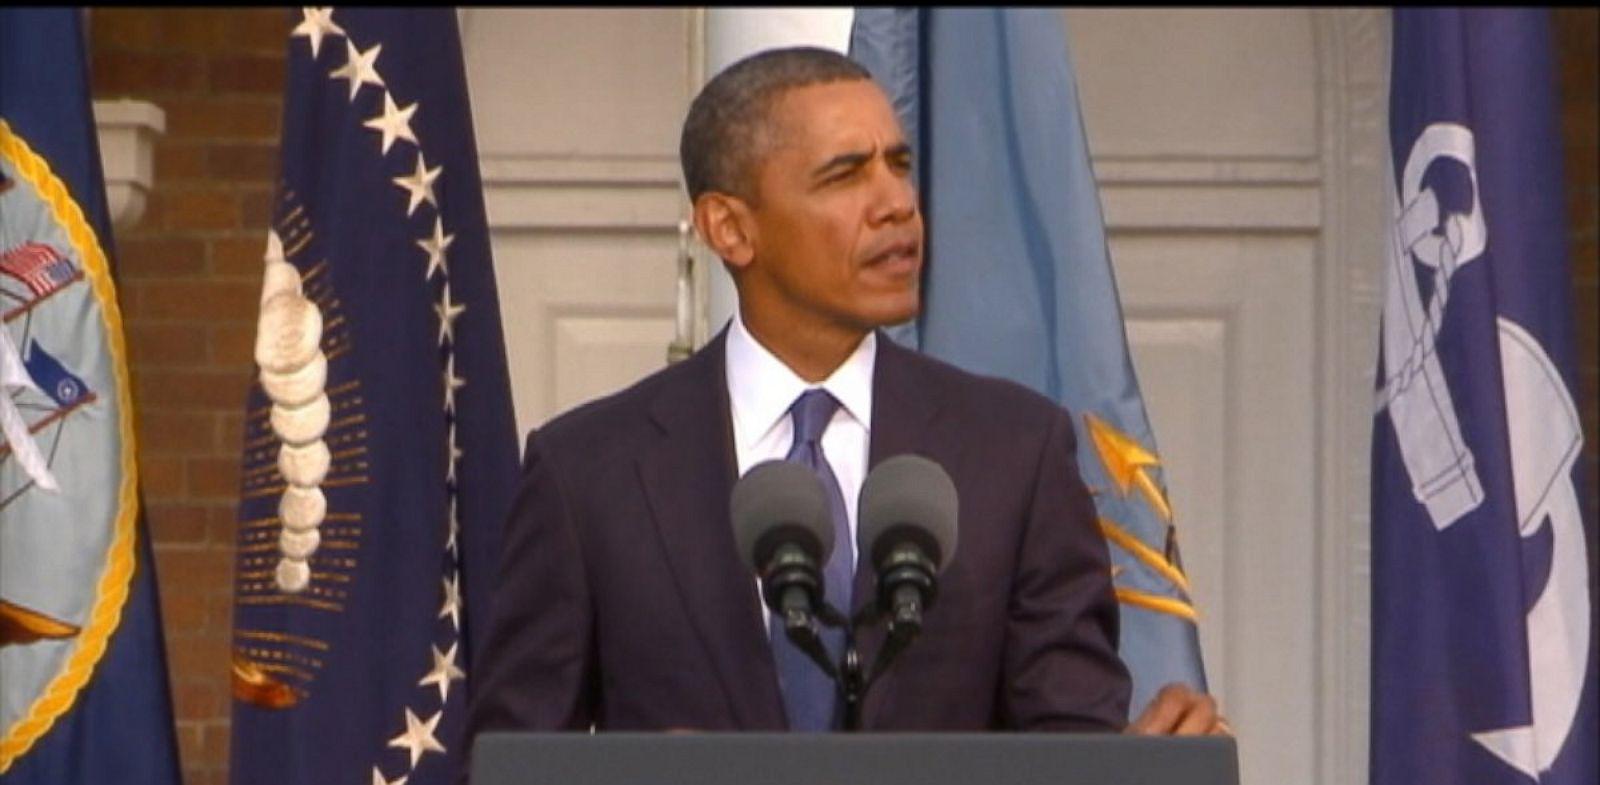 PHOTO: President Barack Obama speaks at the Navy Yard Memorial Service in Washington, Sept. 22, 2013.